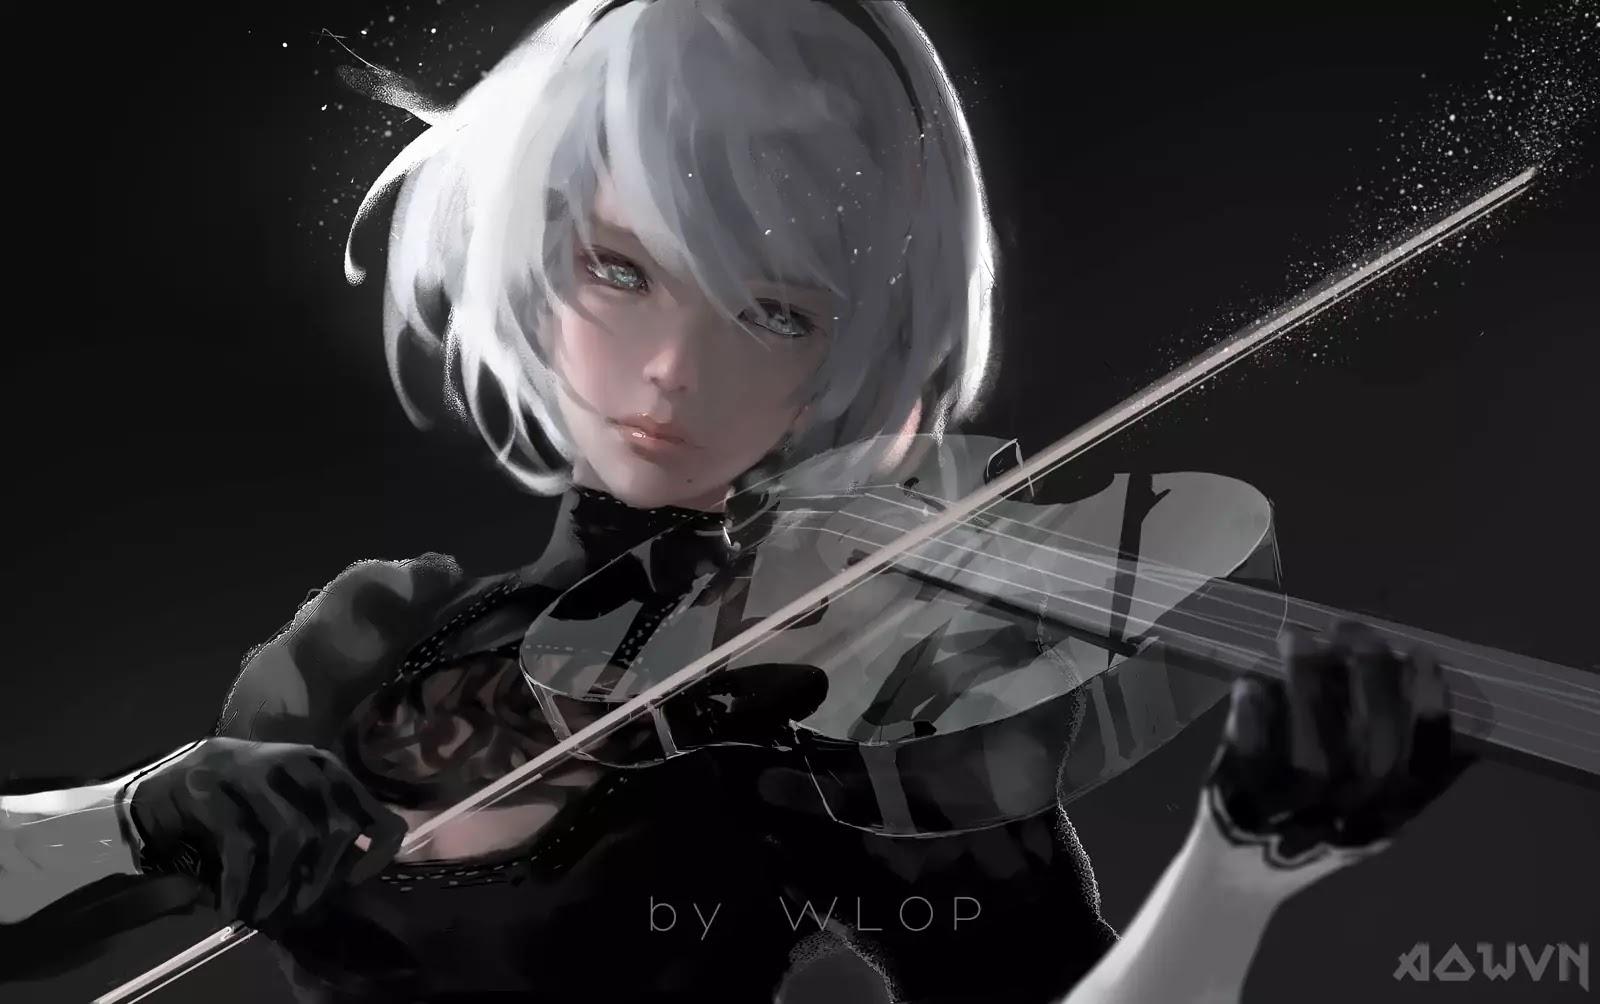 17 AowVN.org m - [ Hình Nền ] Anime Cực Đẹp by Wlop | Wallpaper Premium / Update